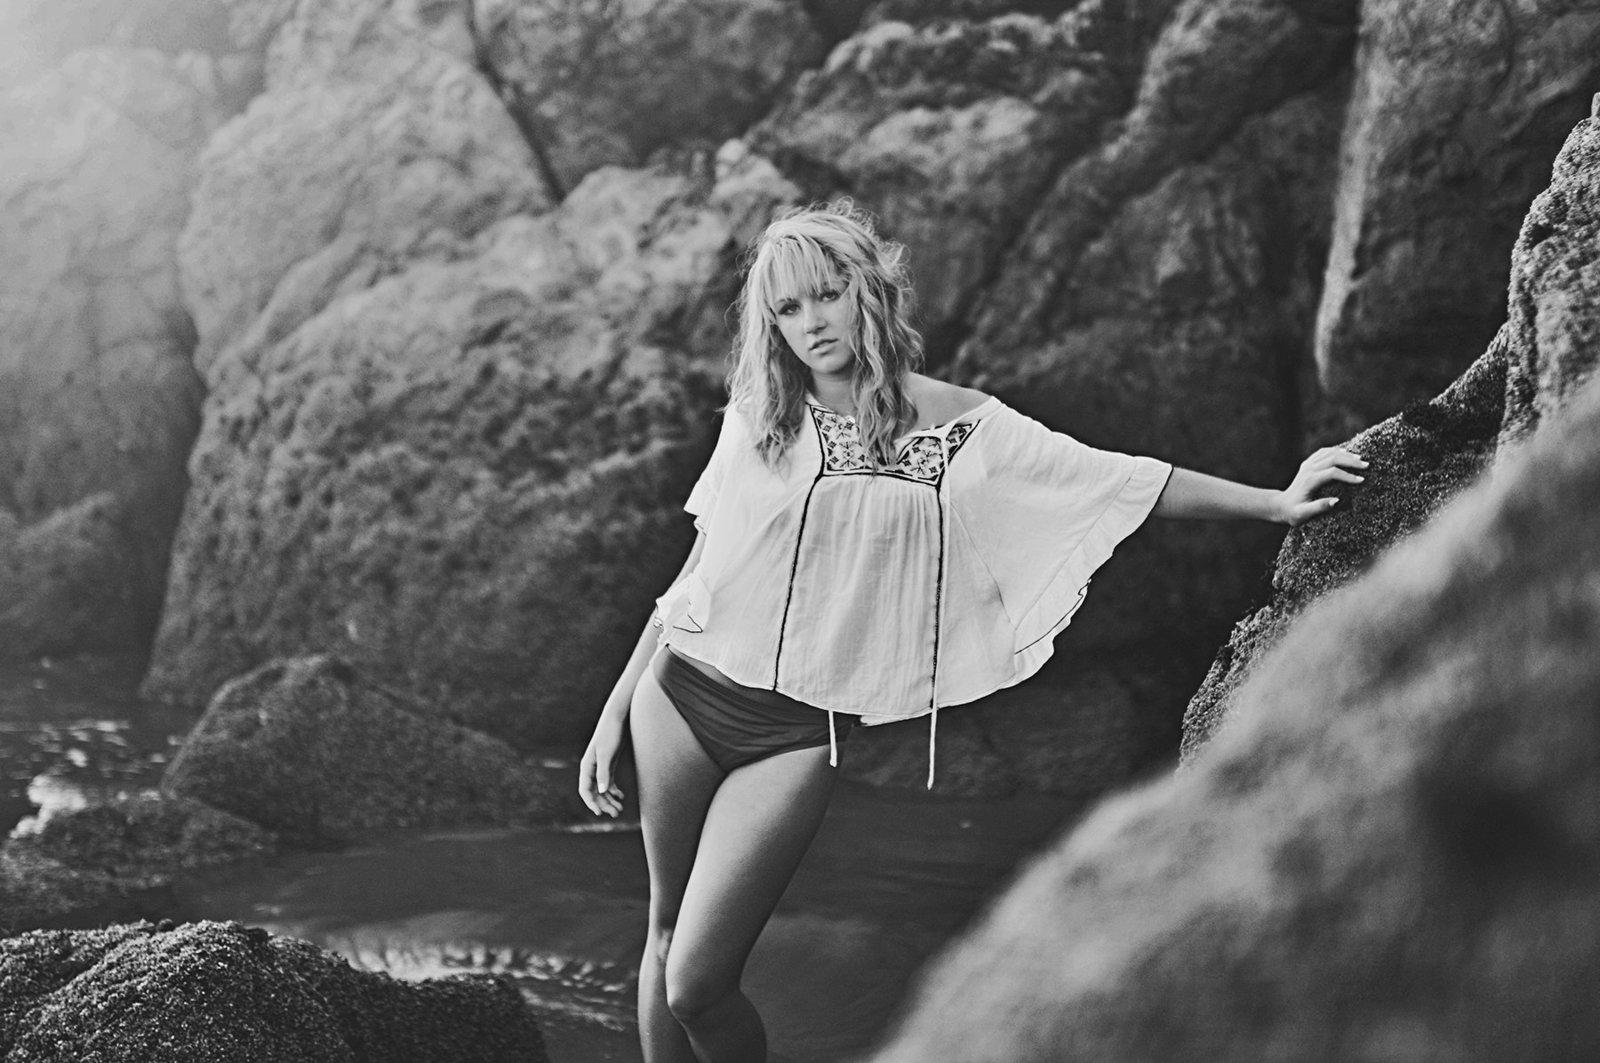 san francisco california senior photos destination portrait photographer bryan newfield photography 52